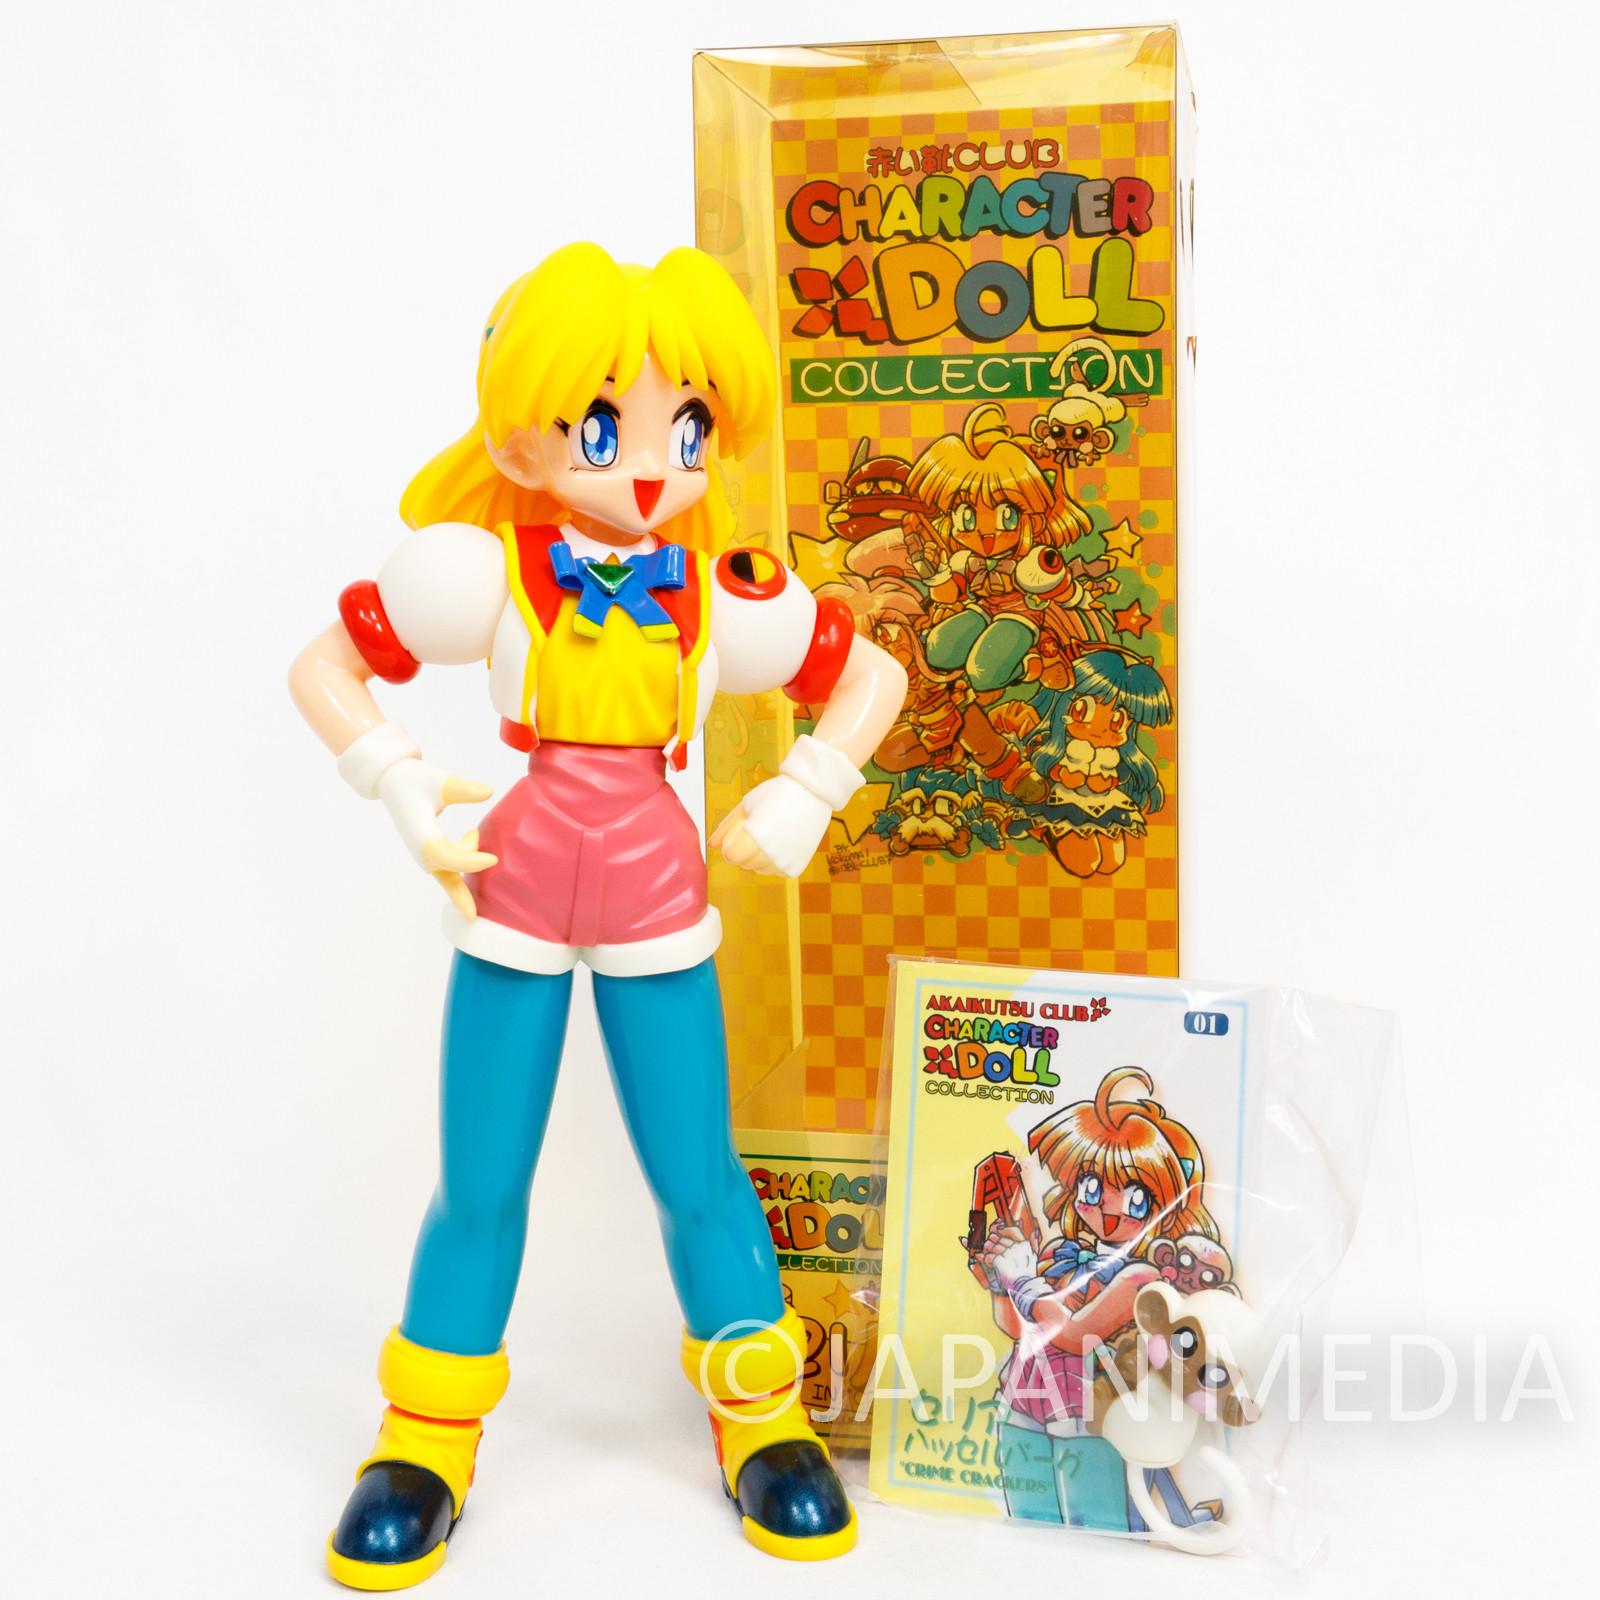 Crime Crackers 2 Seria Soft Vinyl Figure PS2 GAME Character JAPAN